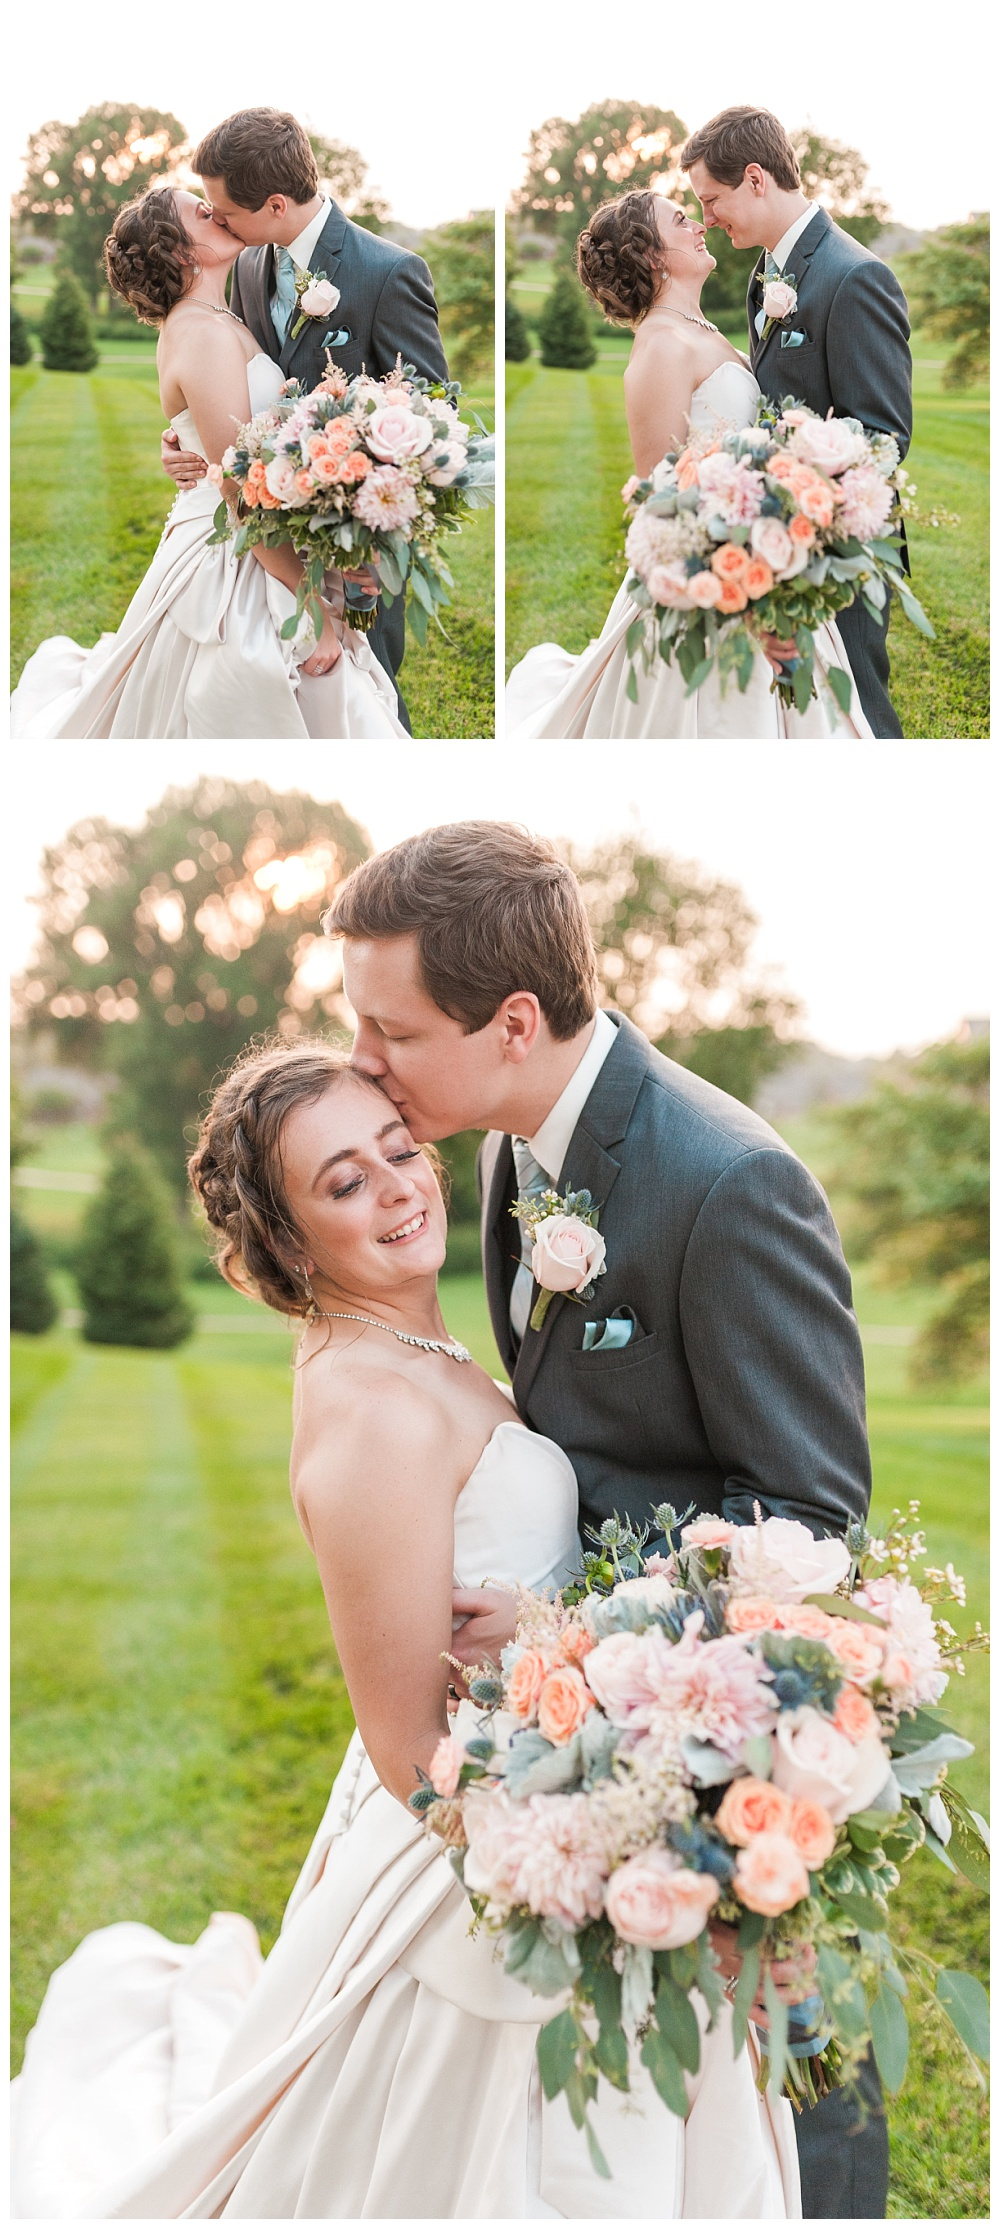 Stephanie Marie Photography Noahs Event Venue Omaha Nebraska Wedding Photographer Danielle Alex Herman_0036.jpg